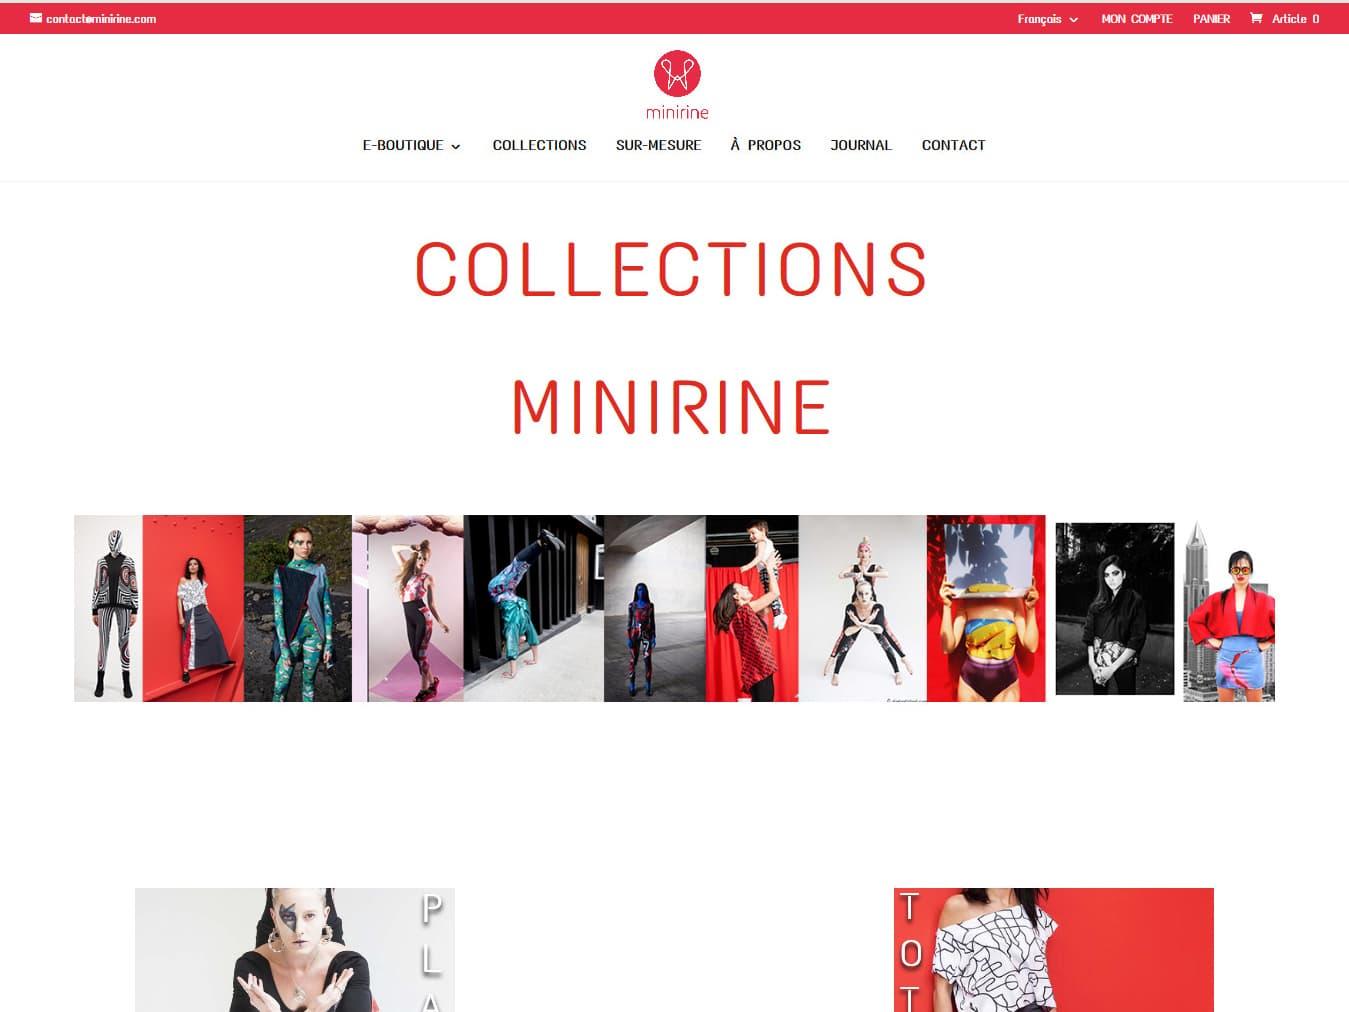 collections_minirine_auriah_rogné